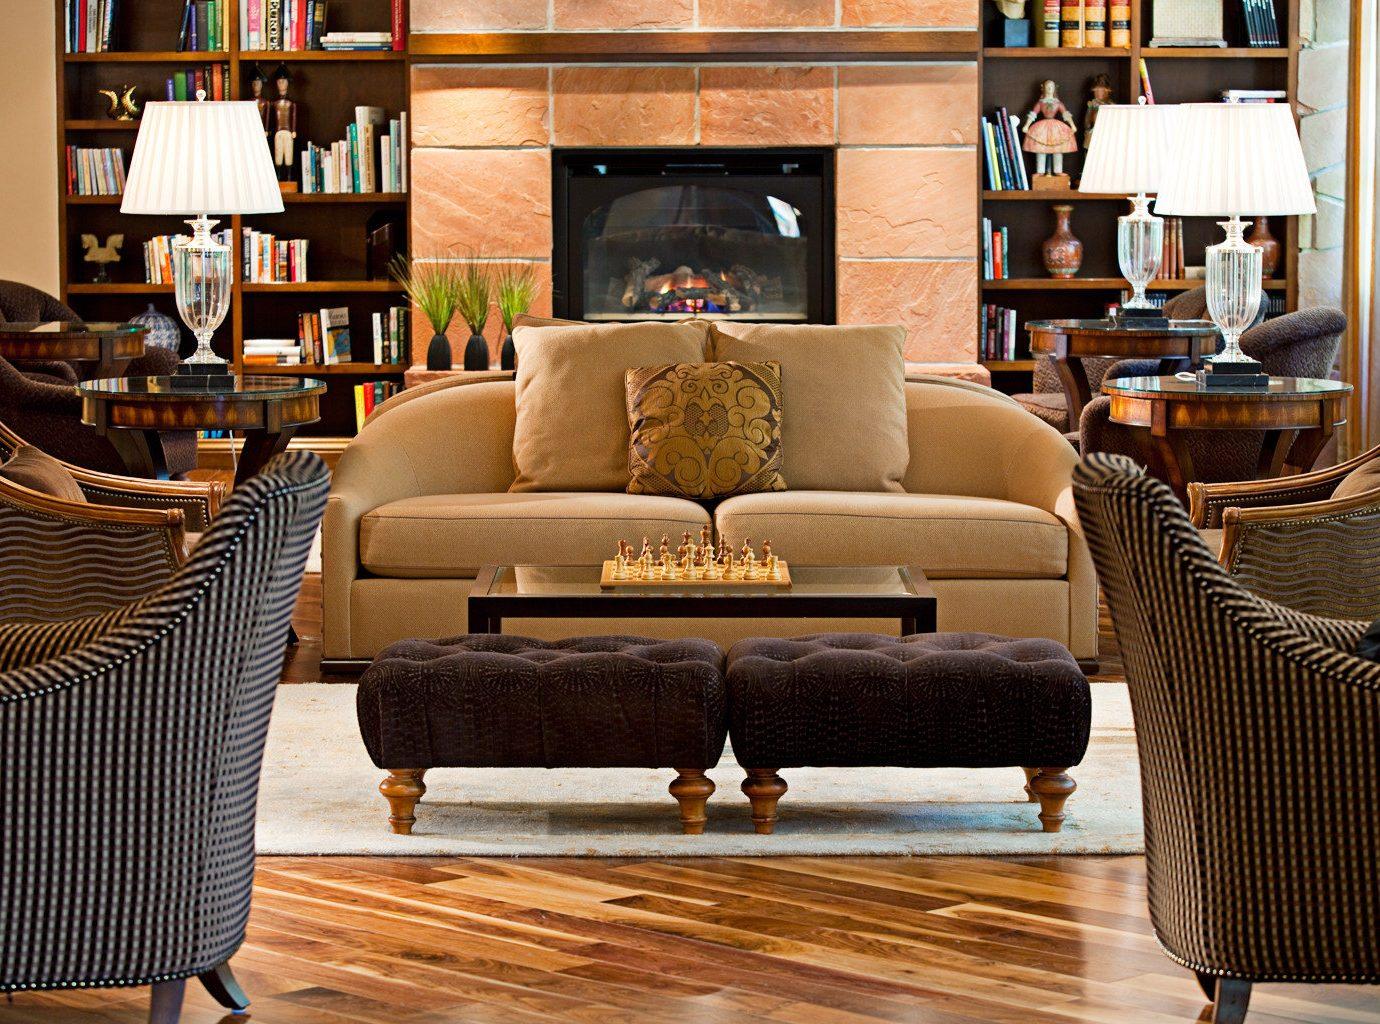 Hip Lounge Luxury sofa living room chair hardwood home flooring shelf wood flooring bed sheet laminate flooring leather